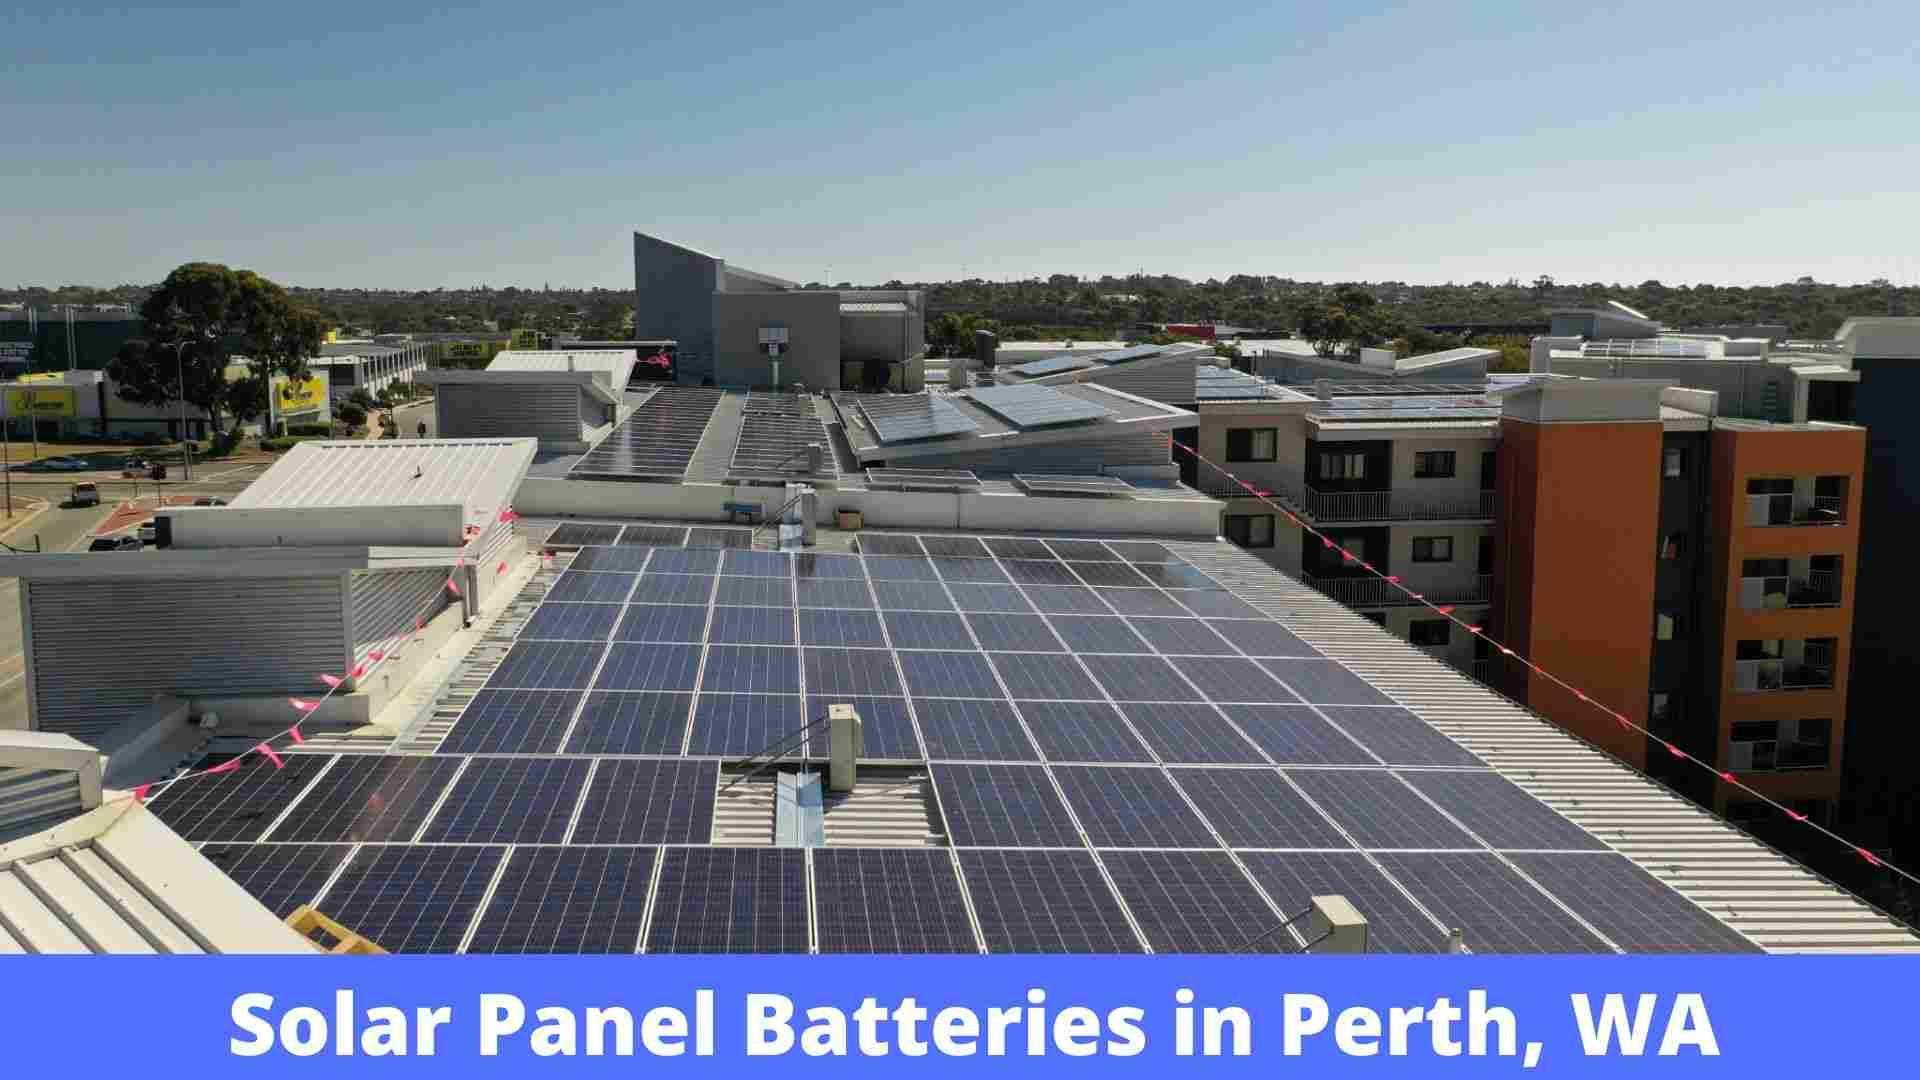 Solar Panel Batteries Installation In Perth Wa Solar Panels Solar Panel Cost Solar Power System